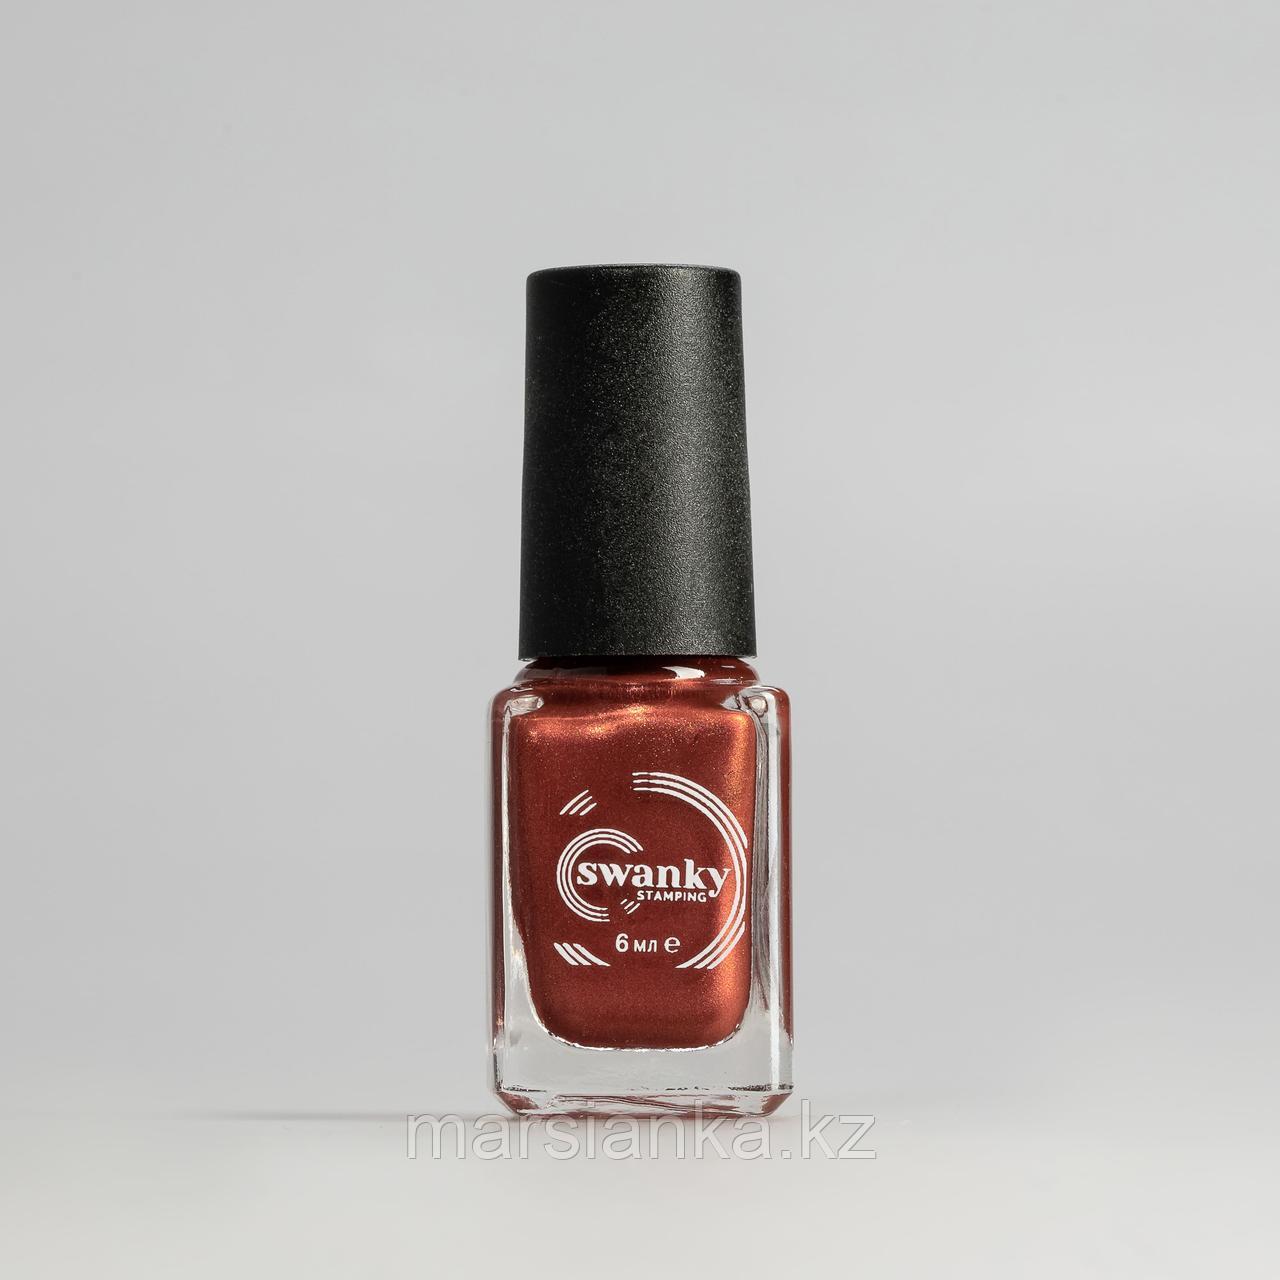 Лак для стемпинга Swanky Stamping М116,красная медь, 6мл